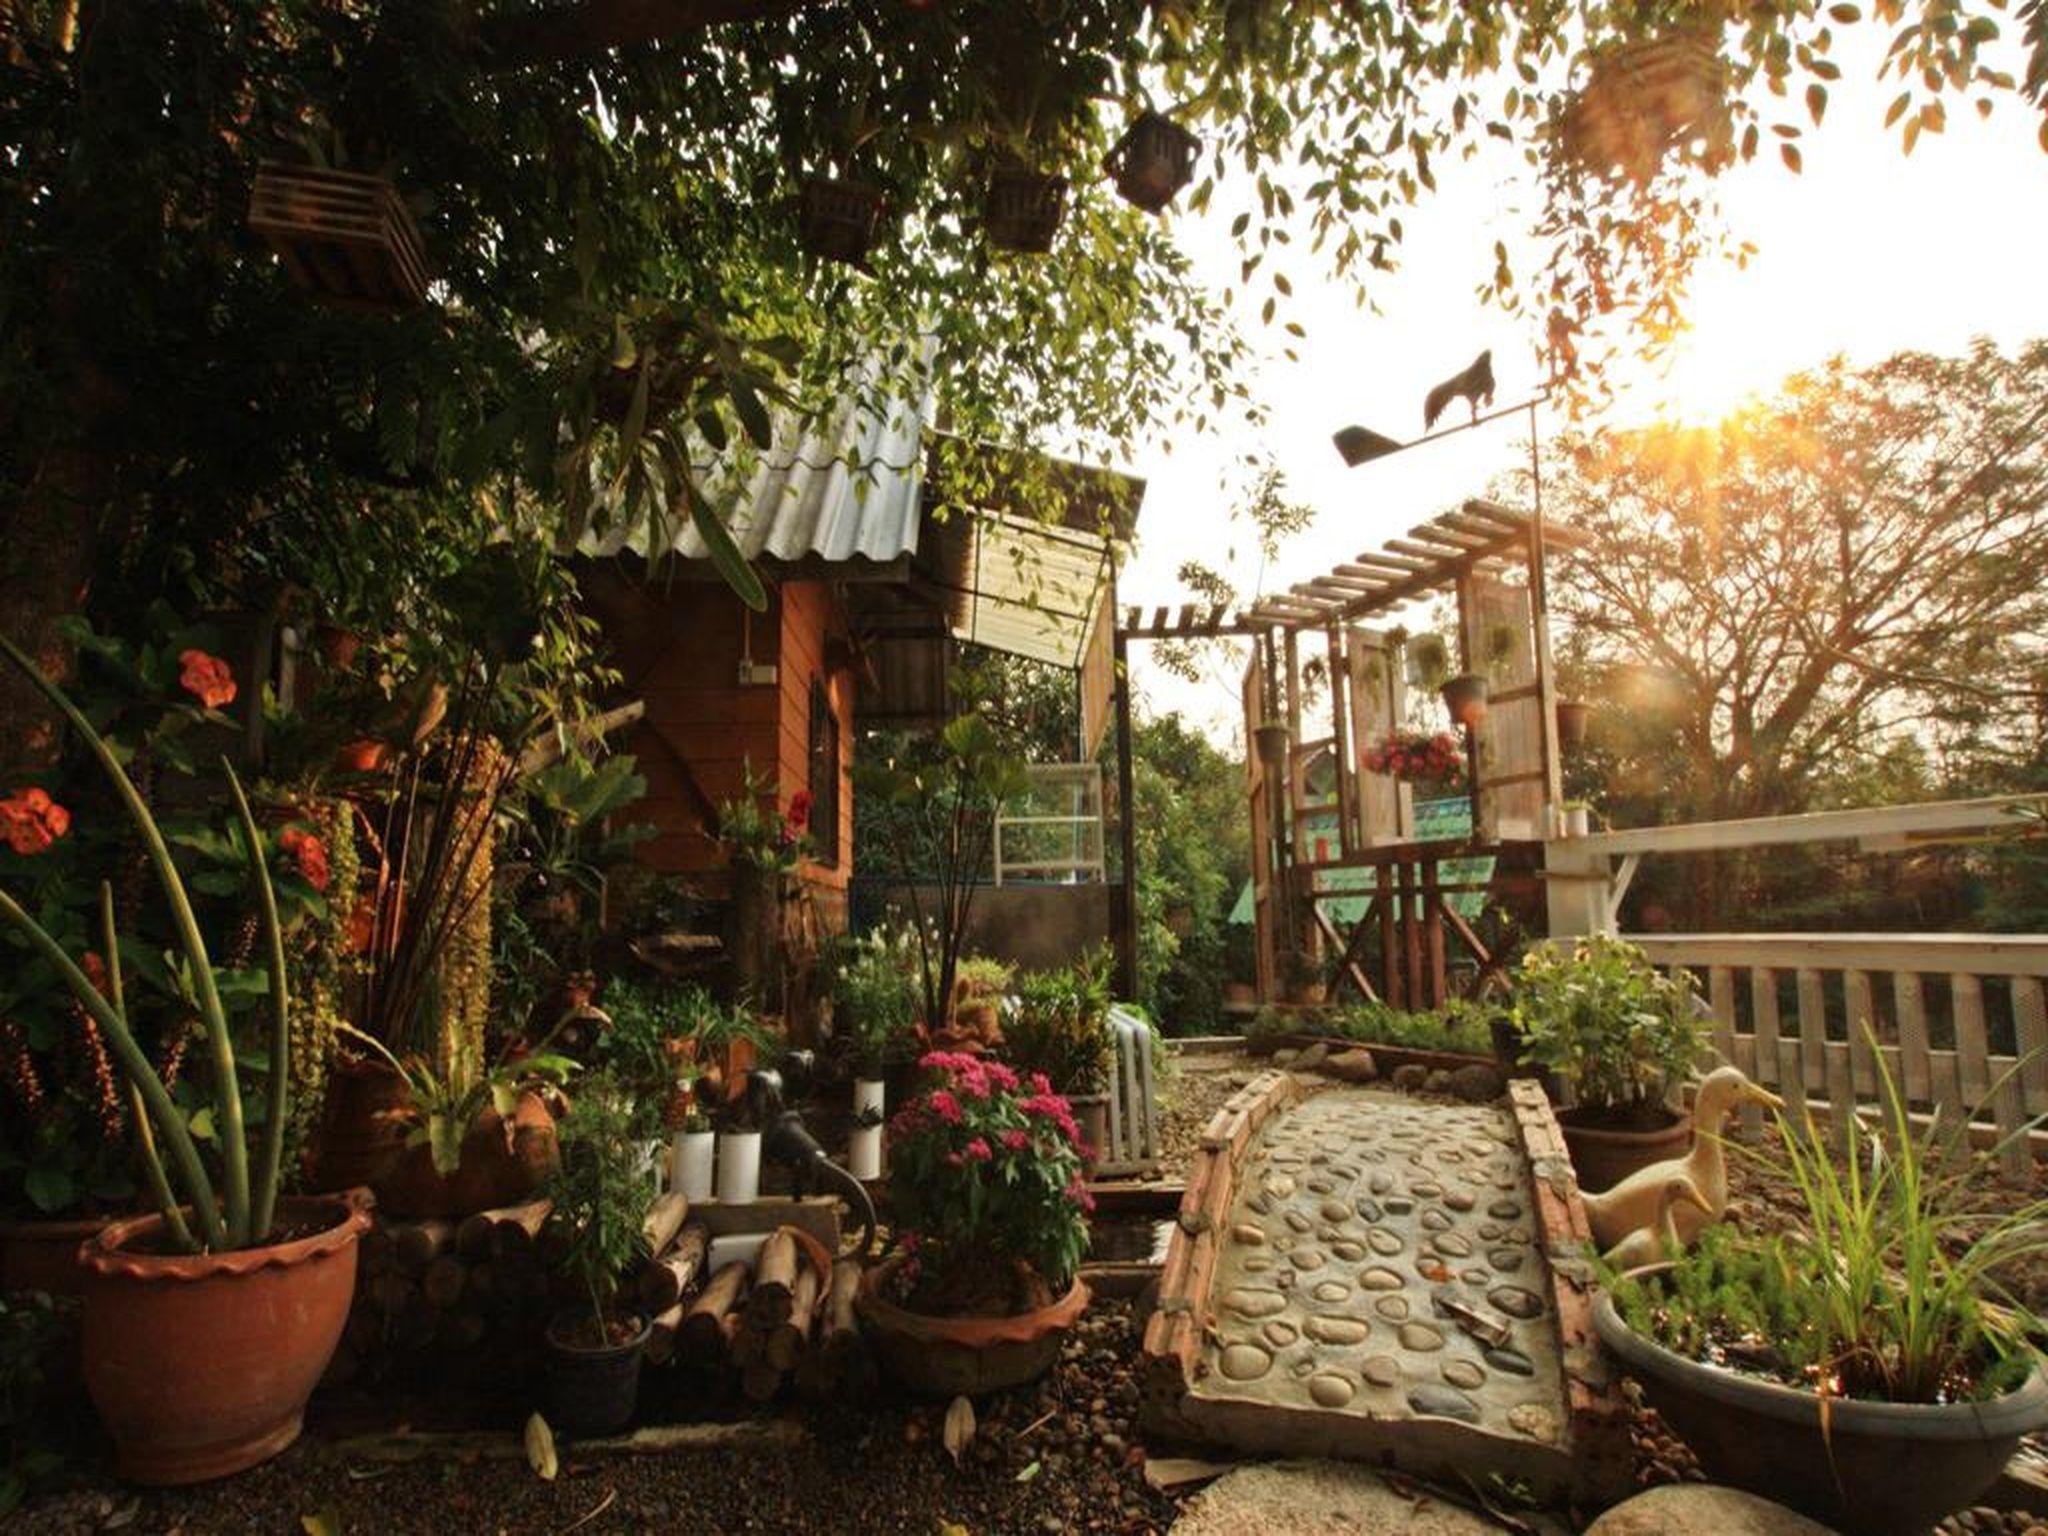 A-Ga-Pe Coffee Bar Restaurant&Hostel,A-Ga-Pe Coffee Bar Restaurant&Hostel